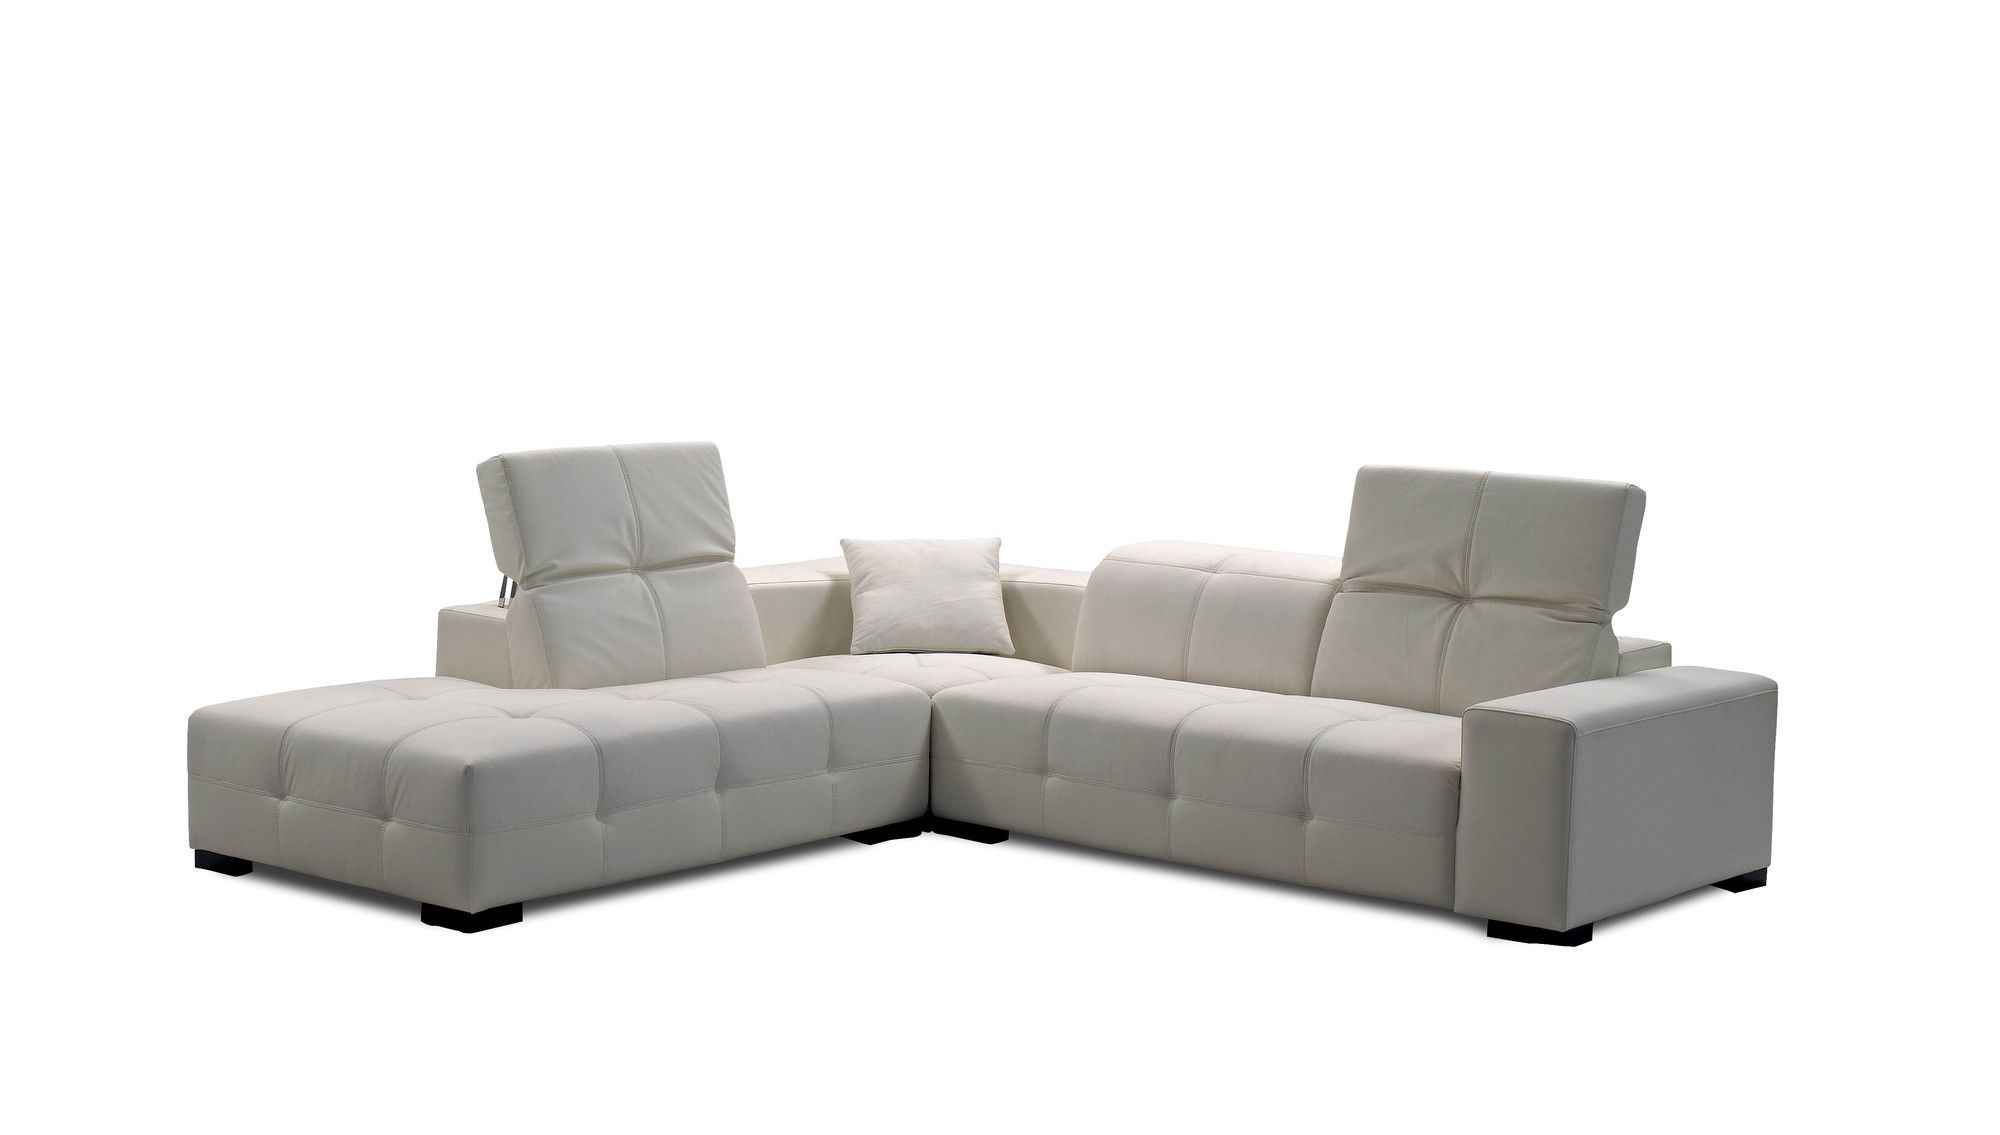 J&M Furniture London Chaise | AllModern